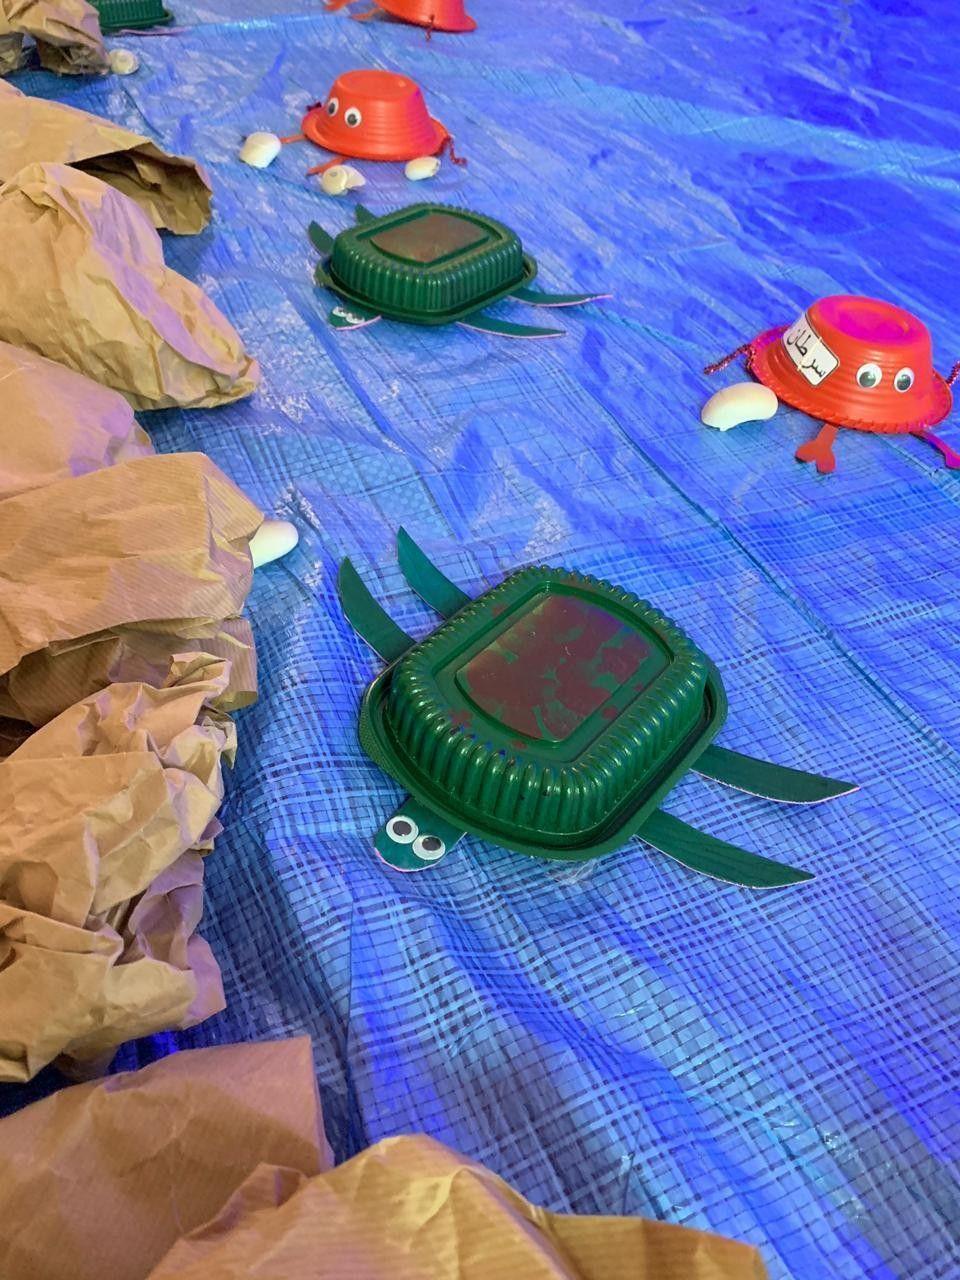 سلاحف و سلطعون بحر مصنوع من صحون بلاستيك وتم تلوينها بالبخاخ Vbs 2016 Submerged Fishing Game Clip Art